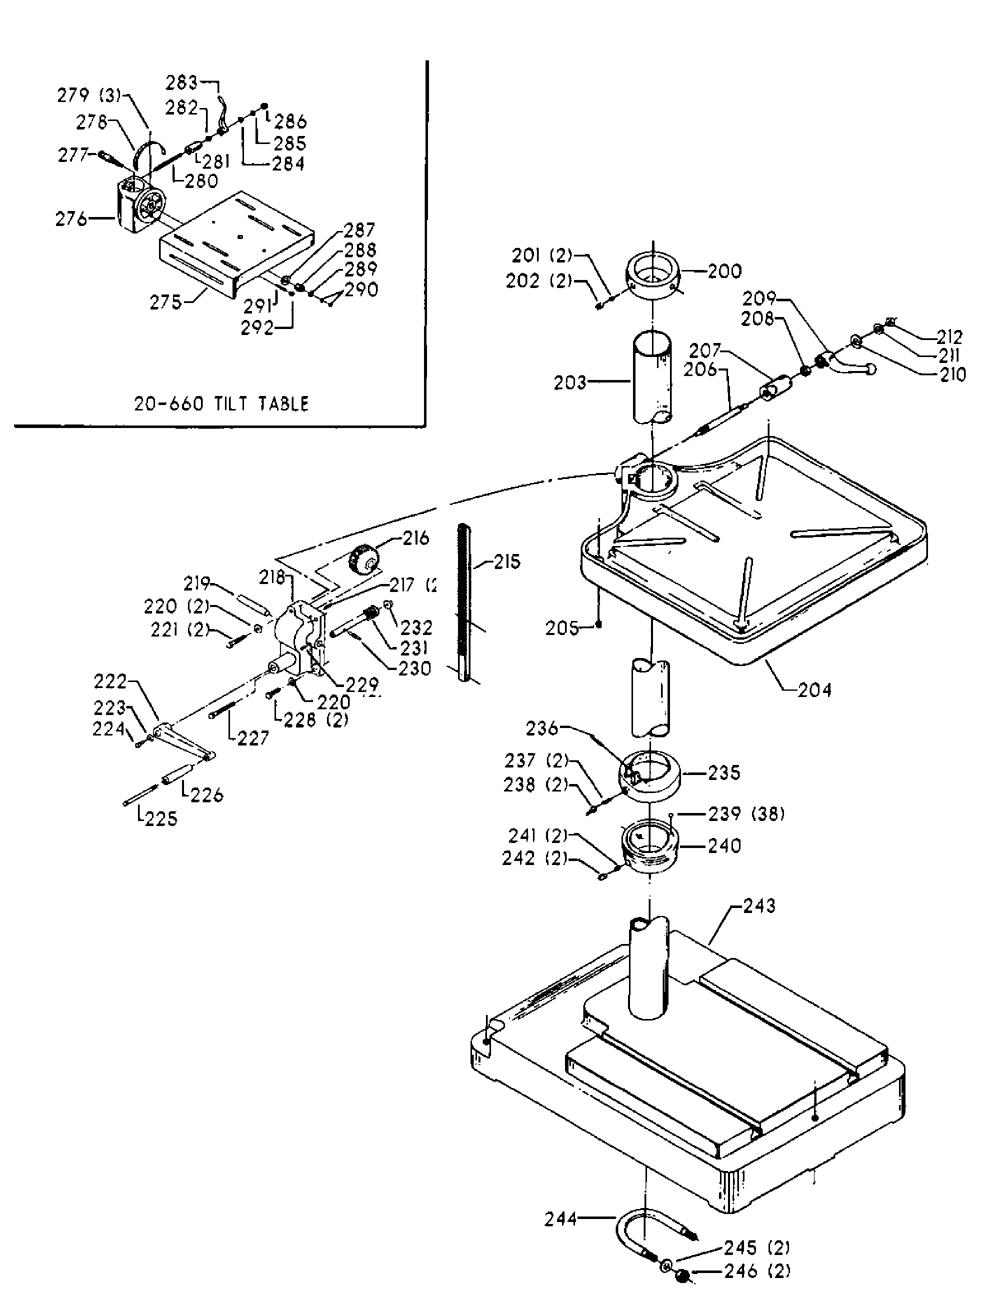 70-210-delta-PB-2Break Down